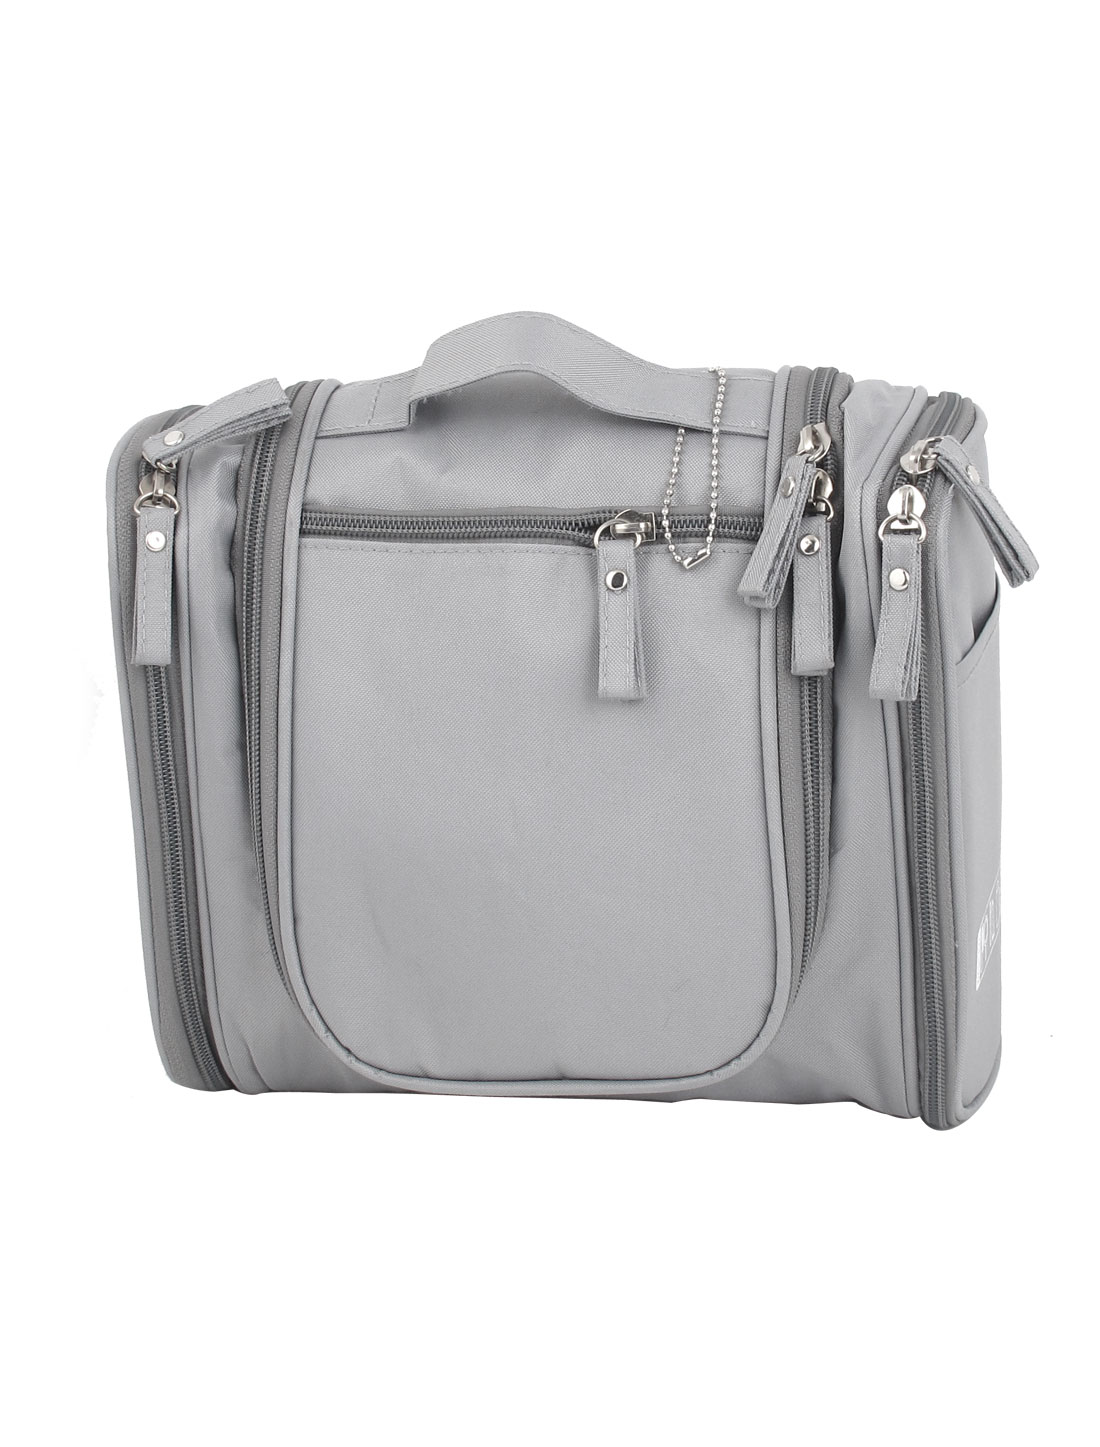 Lady Travel Cosmetic Toiletry Toiletries Hanging Storage Wash Bag Handbag Gray